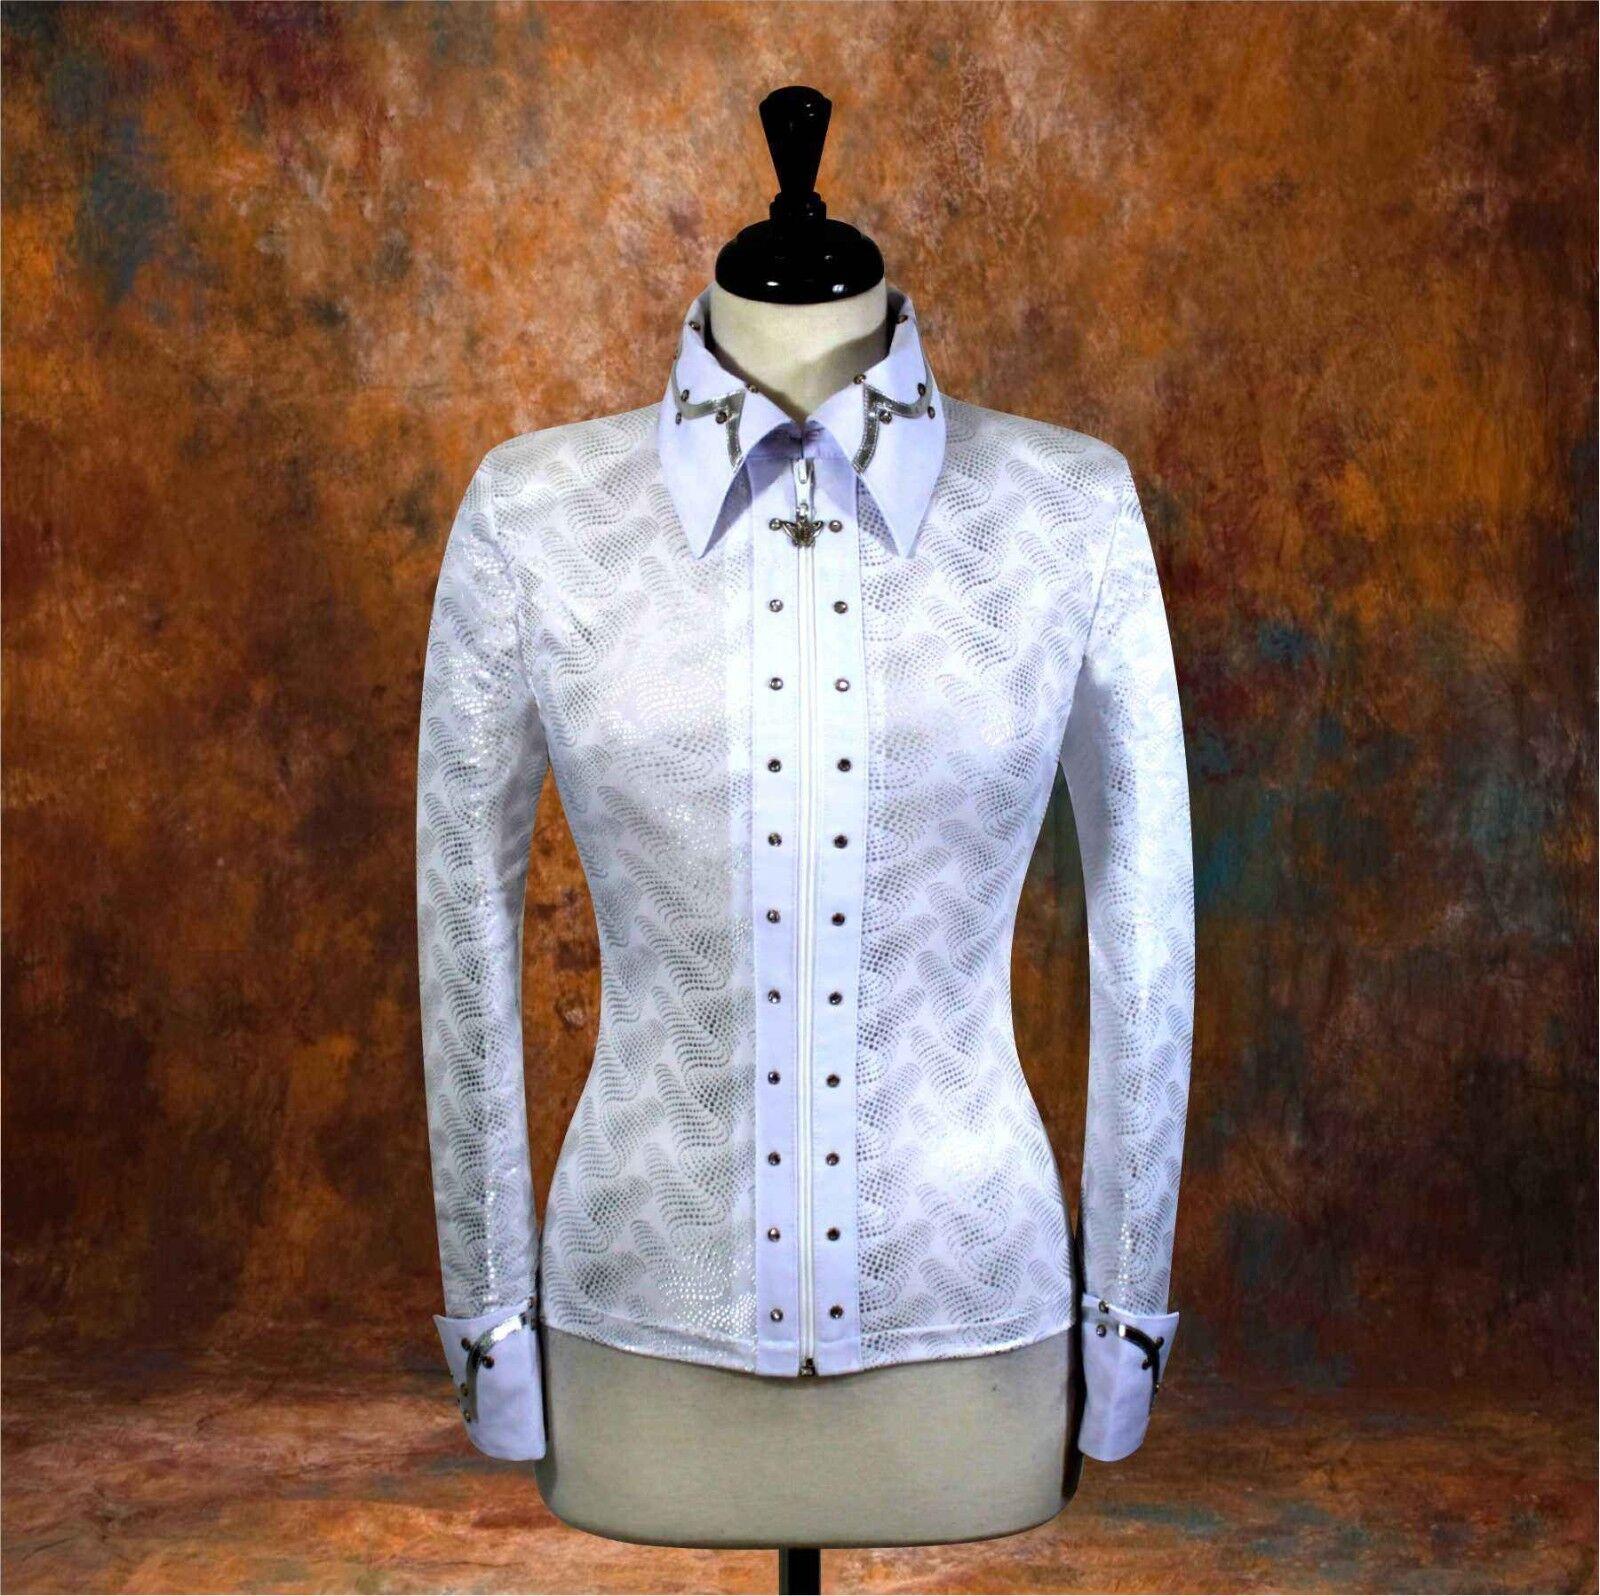 2X-Grande  teatralidad Oeste Chaqueta Camisa Equitación Show Rodeo Queen carril superior